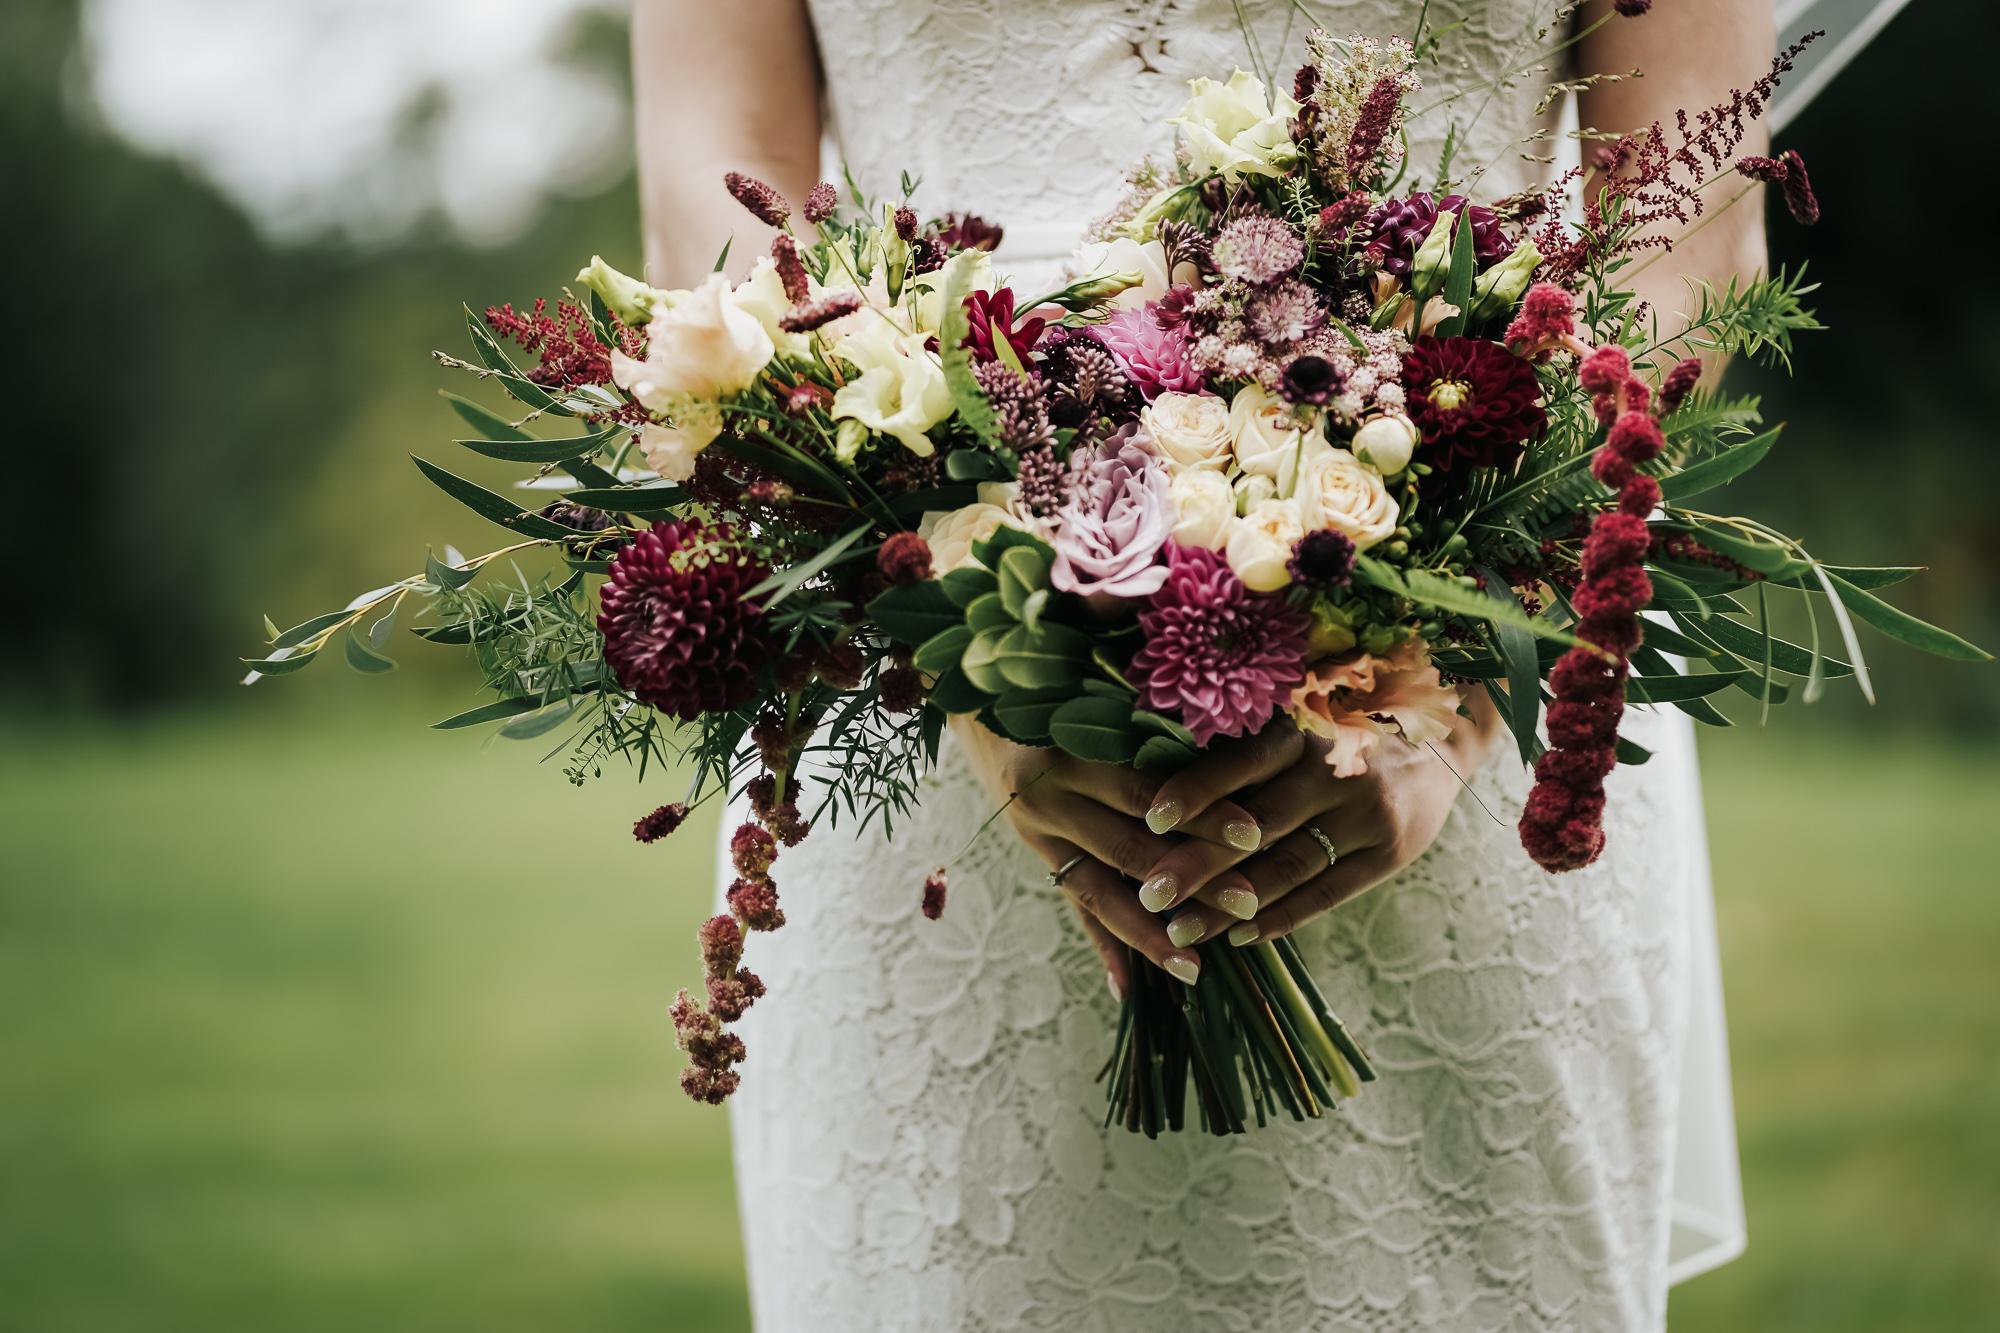 Oak tree of peover wedding photography cheshire wedding photographer (37 of 56).jpg